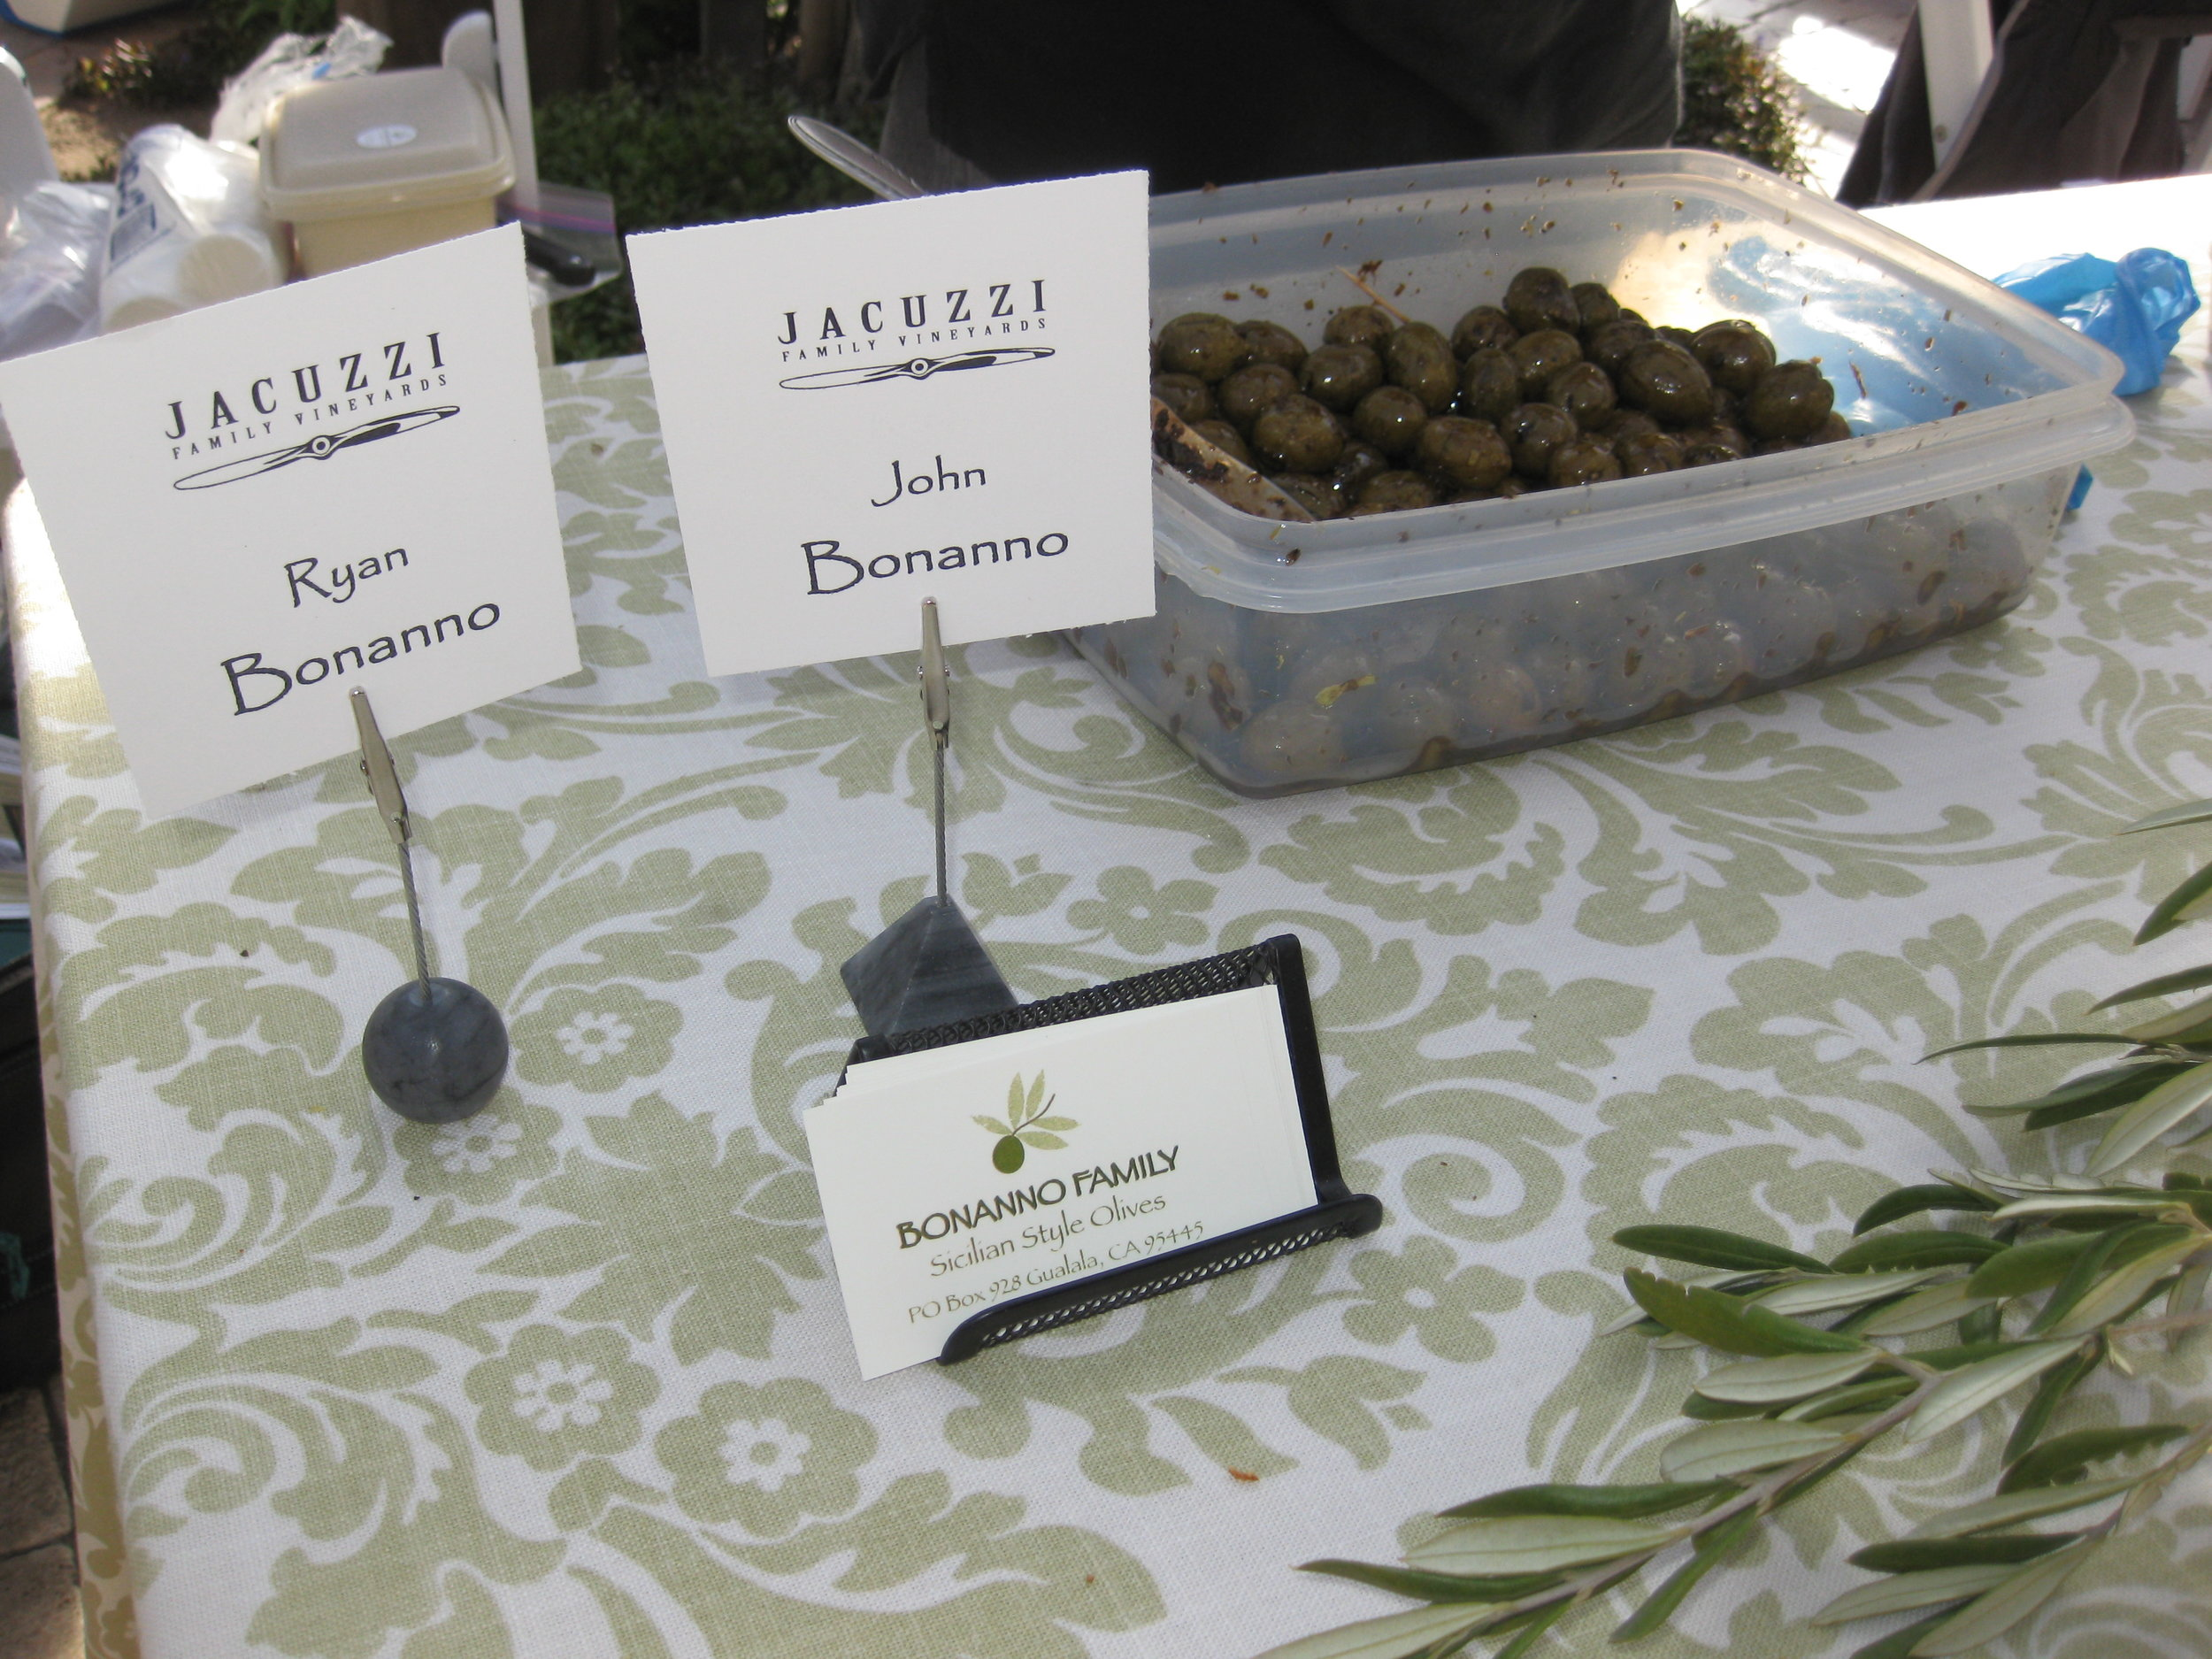 bonanno-family-olives.JPG